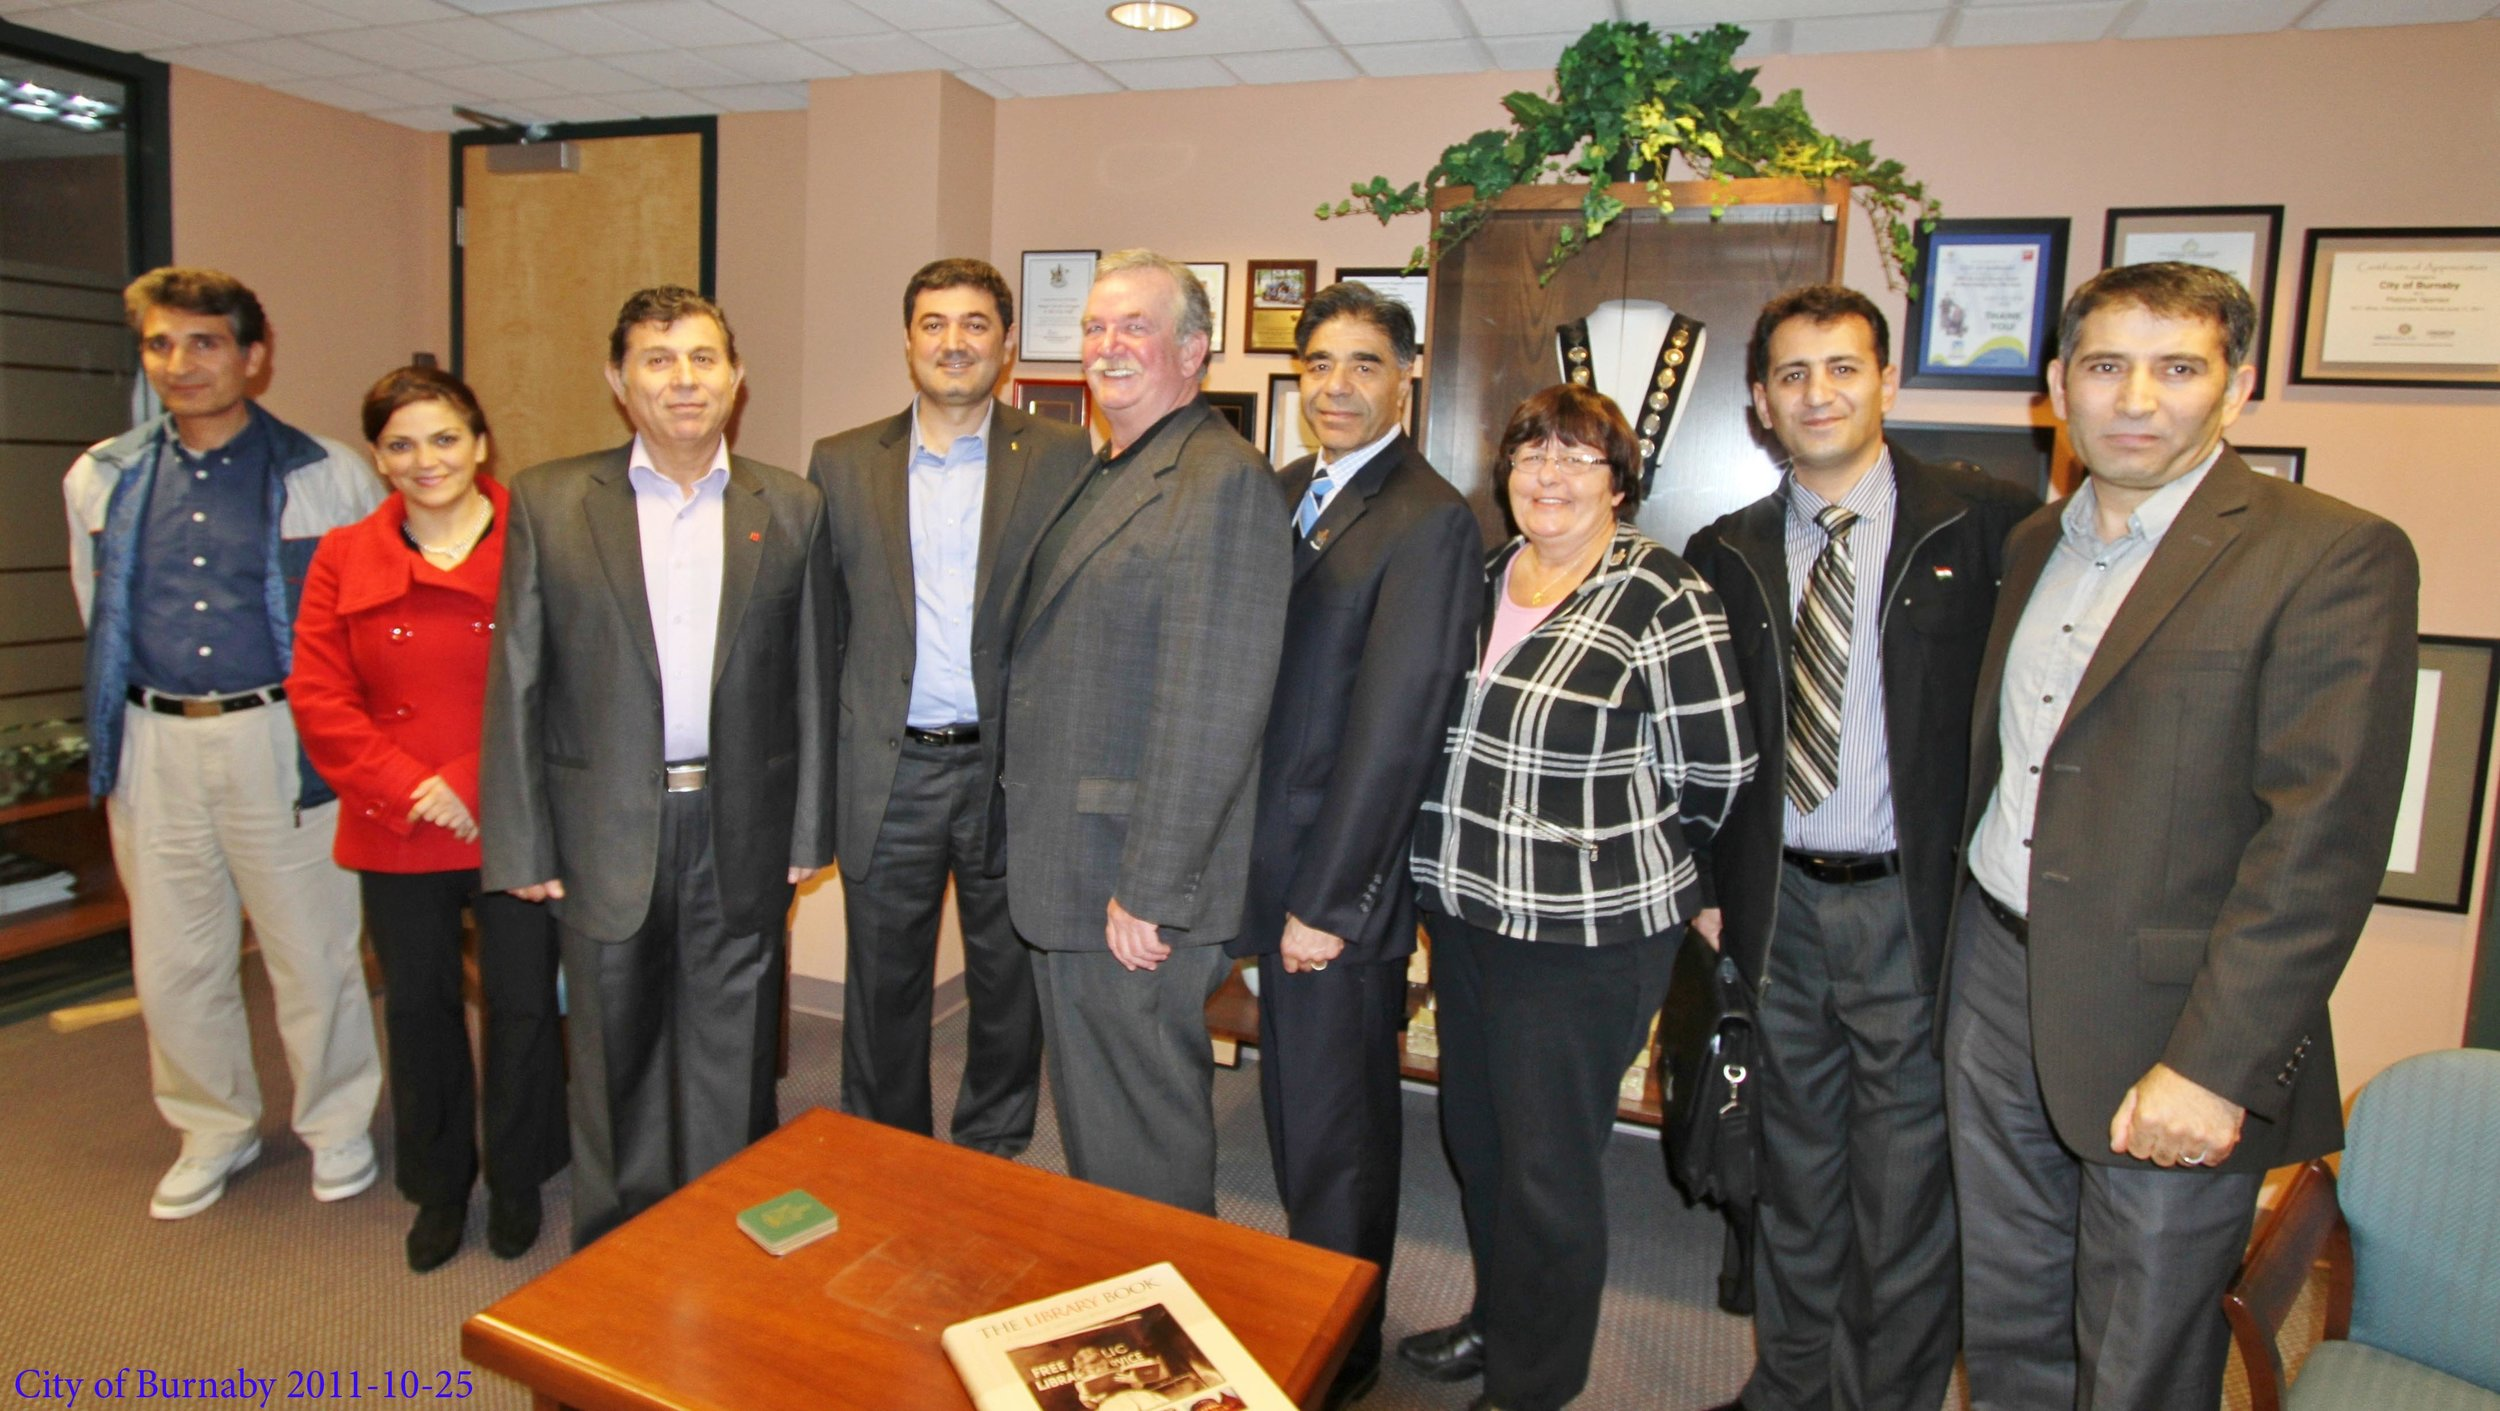 Meeting with mayor of Burnaby